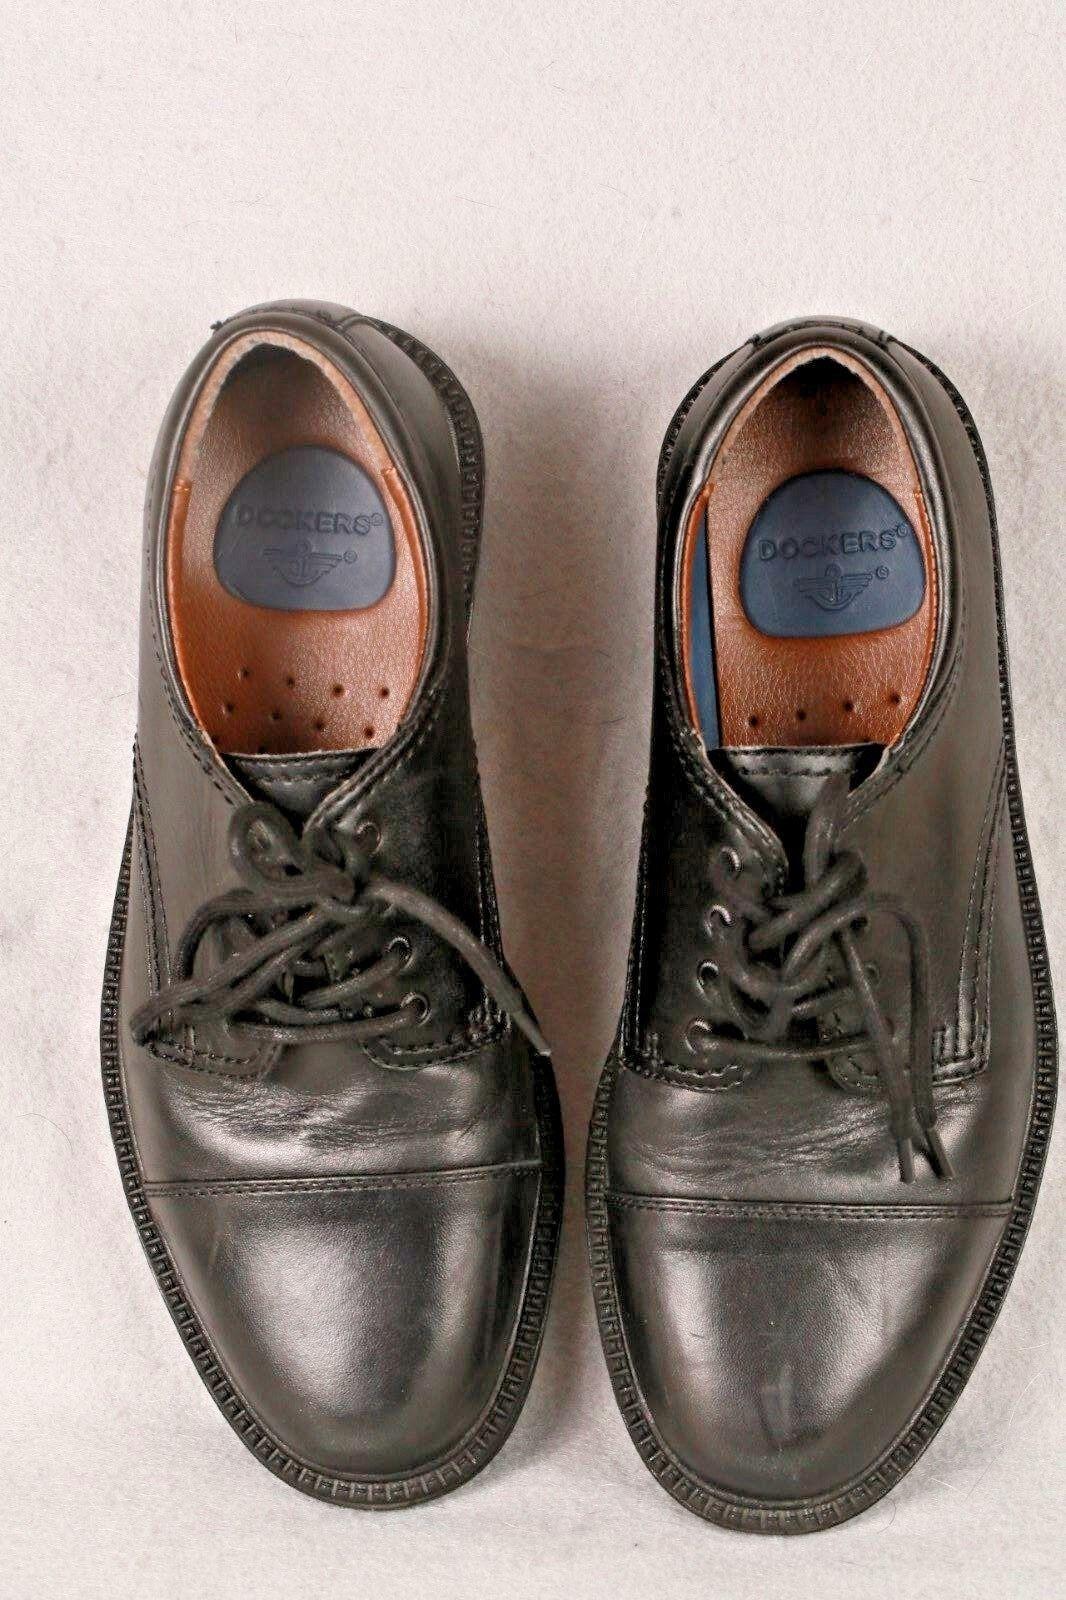 Dockers Gordon 90 2214 Mens Black Leather Oxford Cap Toe Lace Up Shoes Size 7